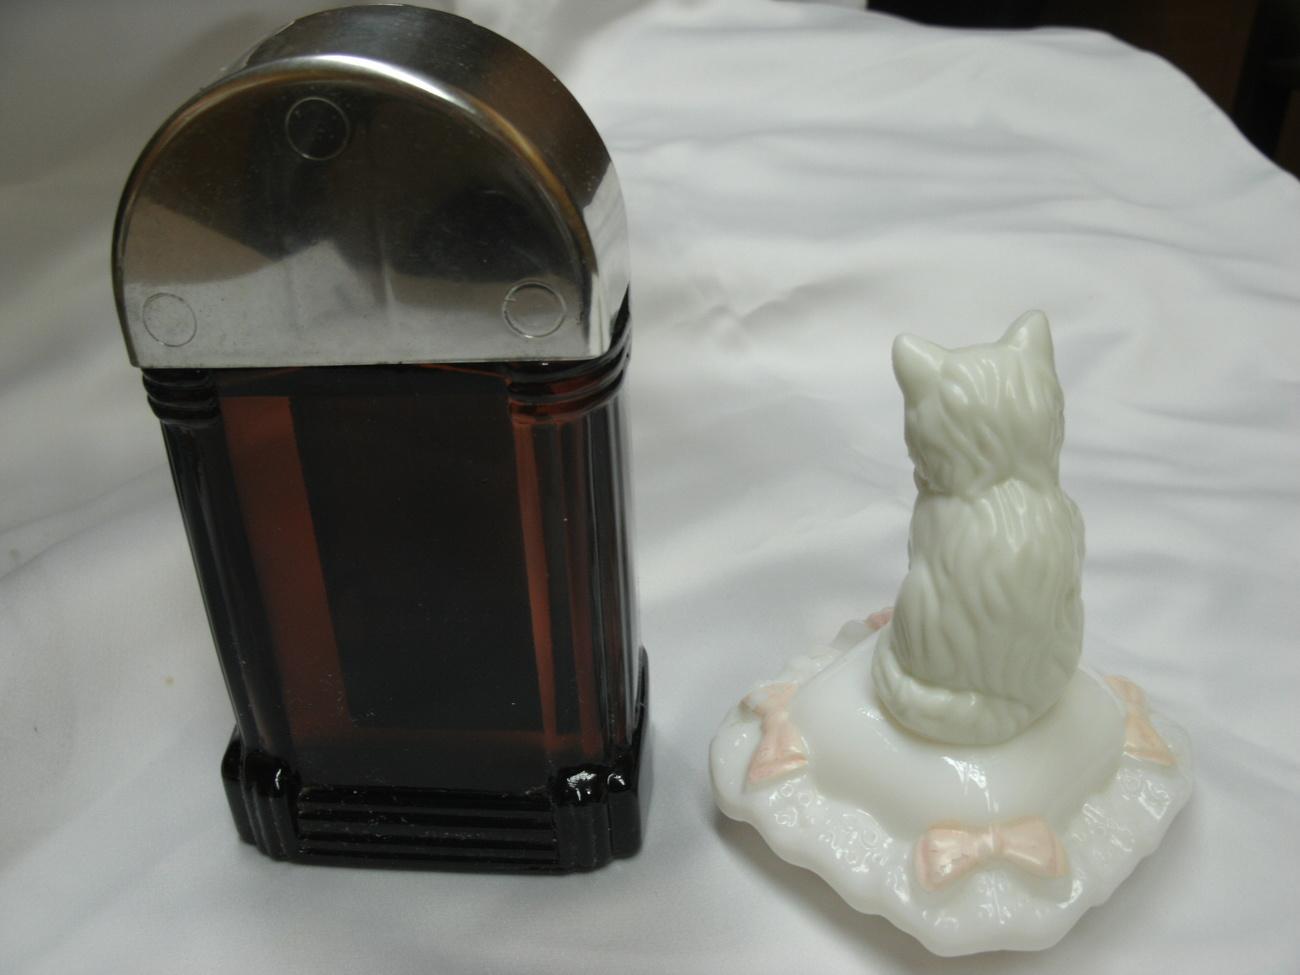 AVON JUKEBOX w/Sweet Honesty & SITTING PRETTY Kitty Cat Collectible Cologne Bott